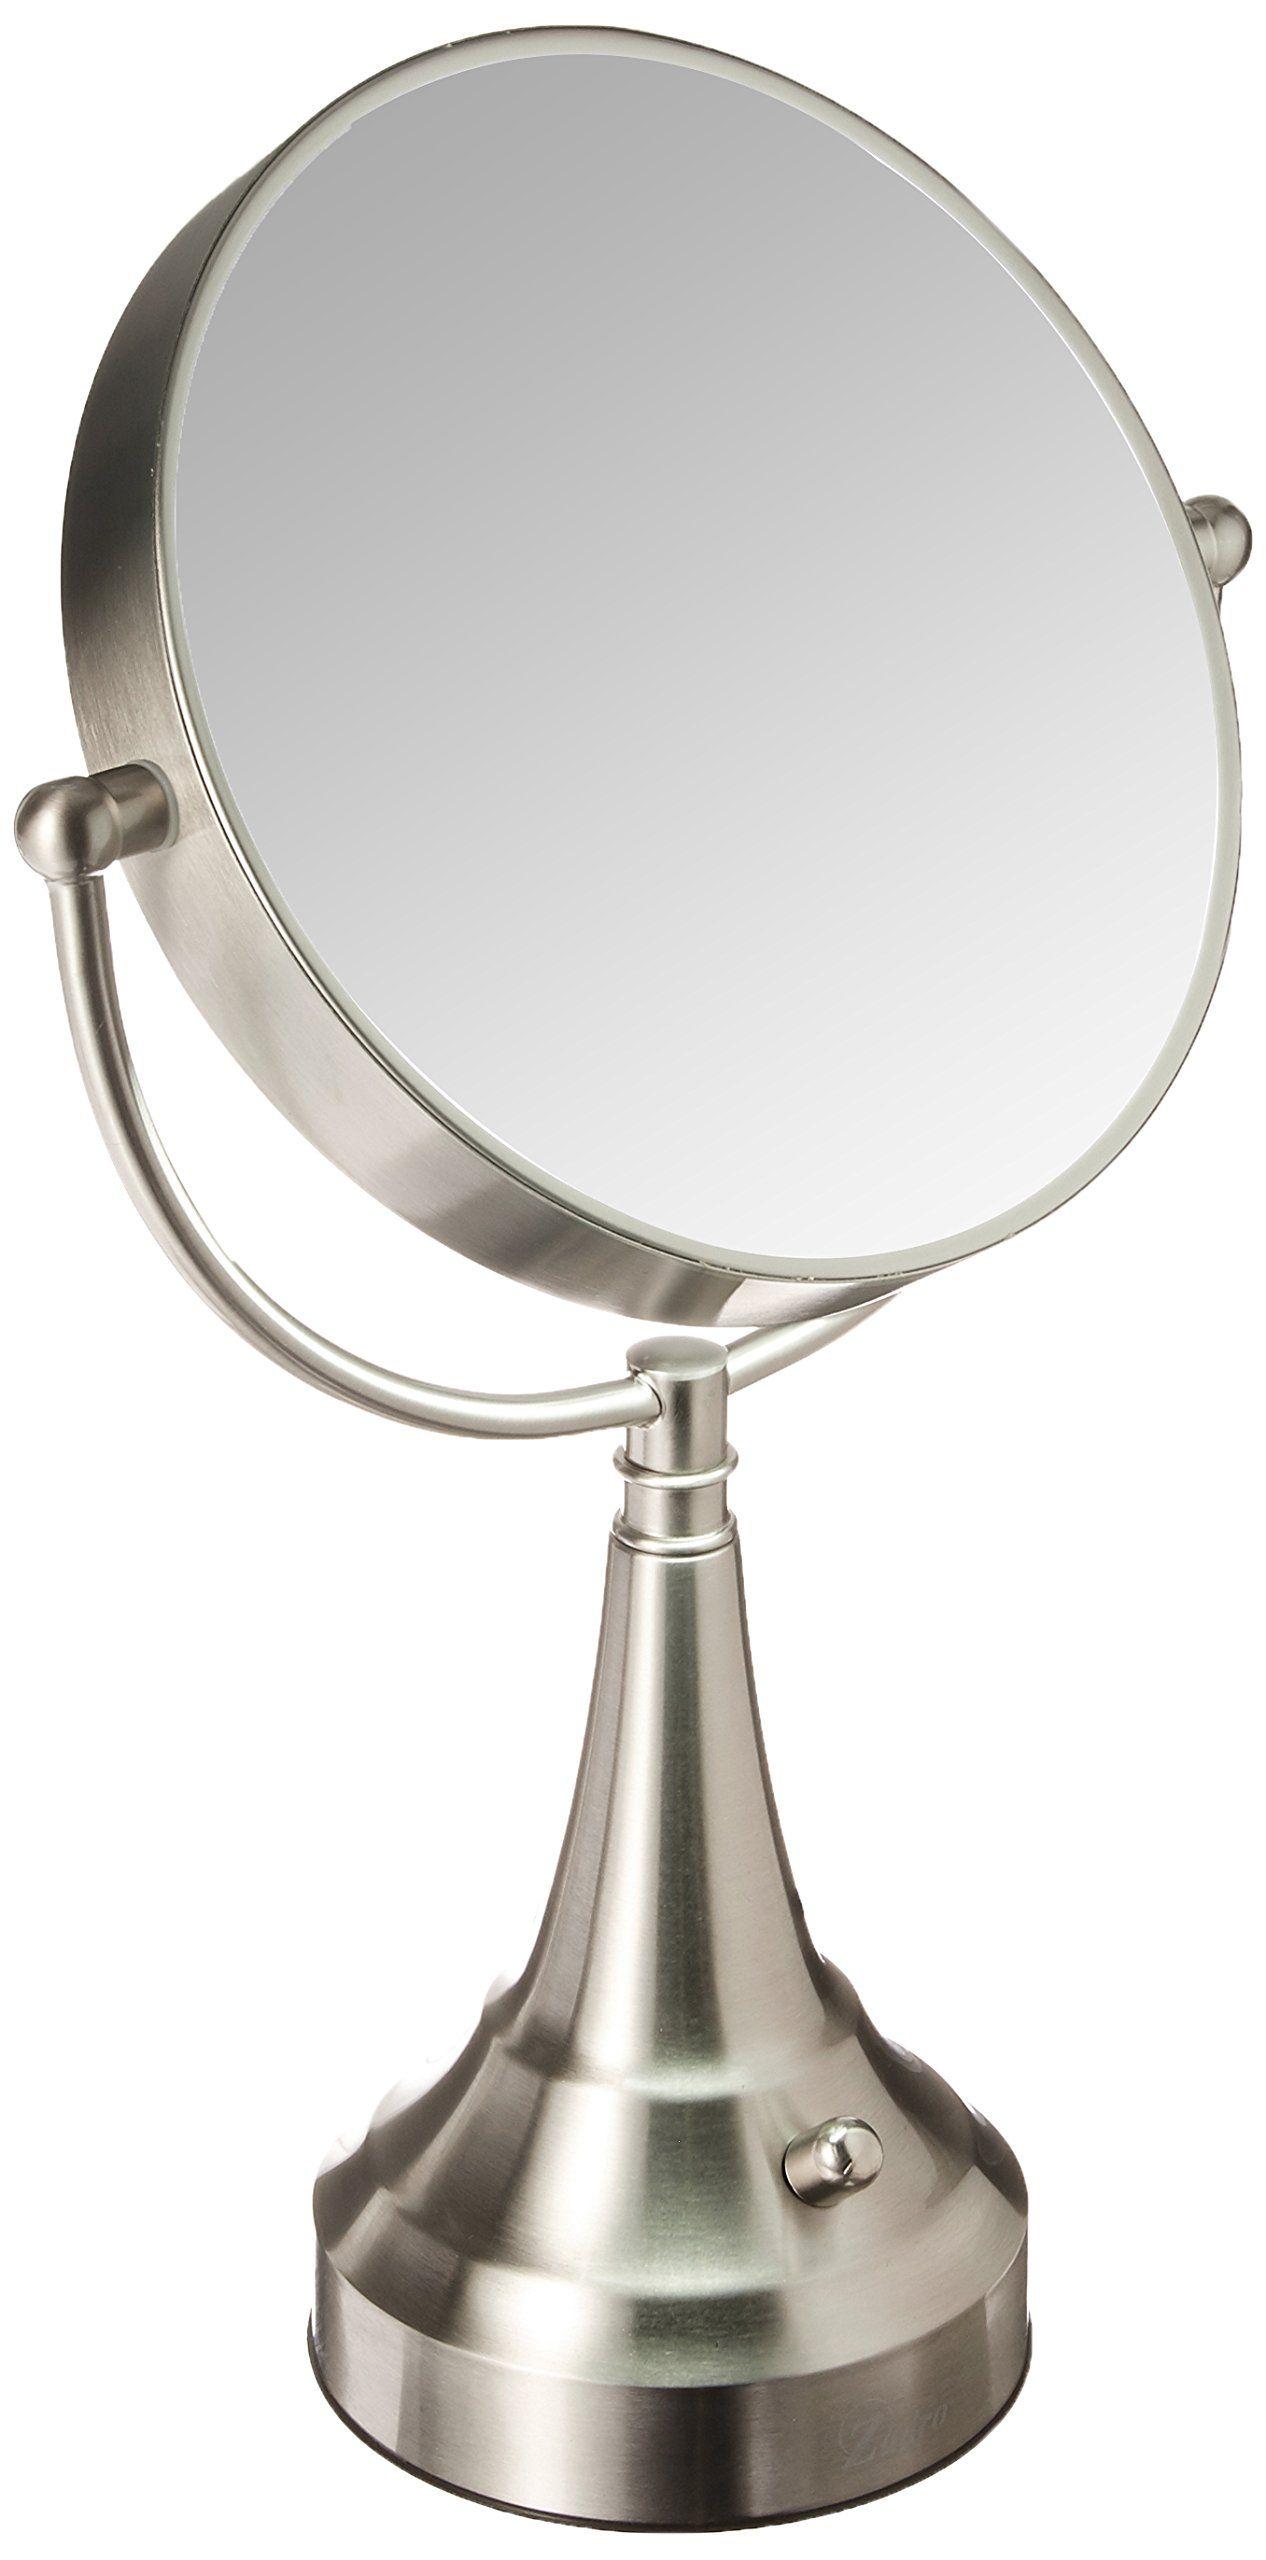 Zadro 10x Mag Next Generation Led Cordless Double Sided Round Vanity Mirror 11inch Satin Nickel Finish You Can Get Addit Mirror Vanity Mirror Nickel Finish